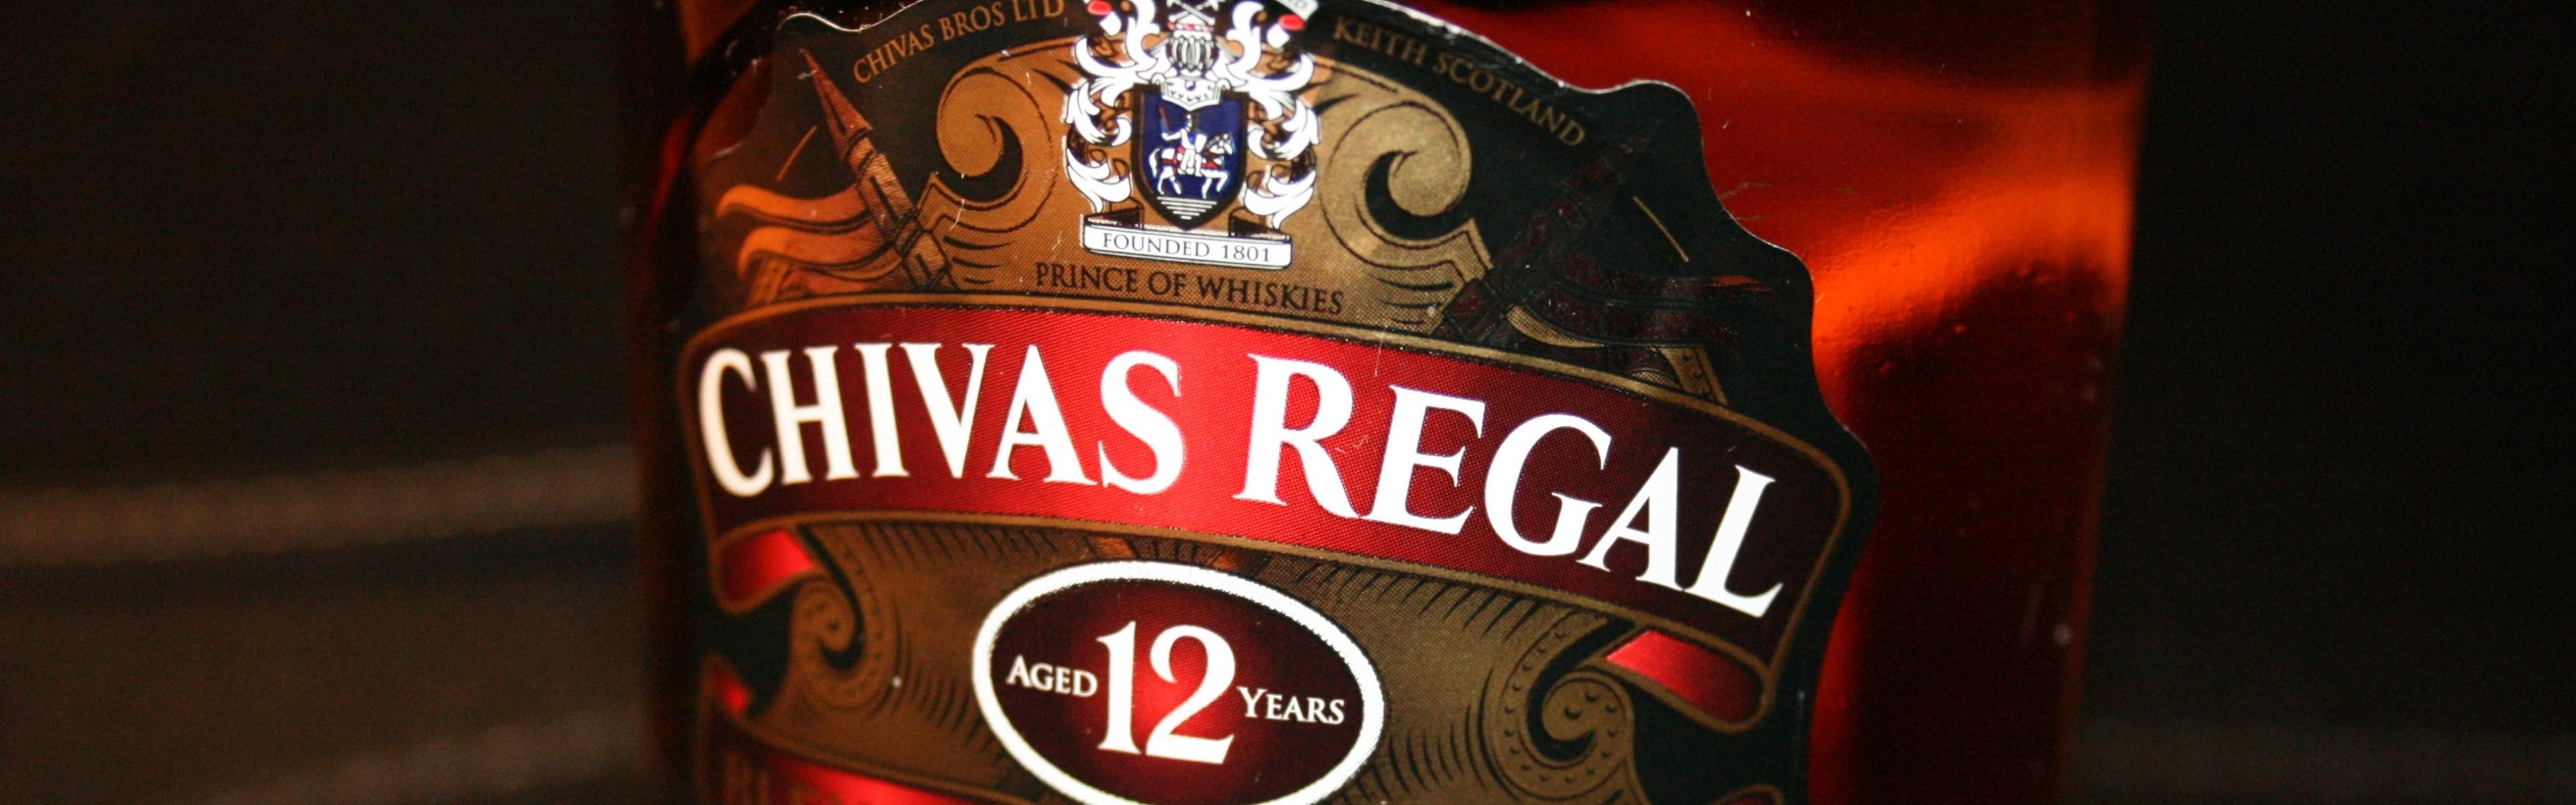 Wallpaper chivas regal, whiskey, alcohol